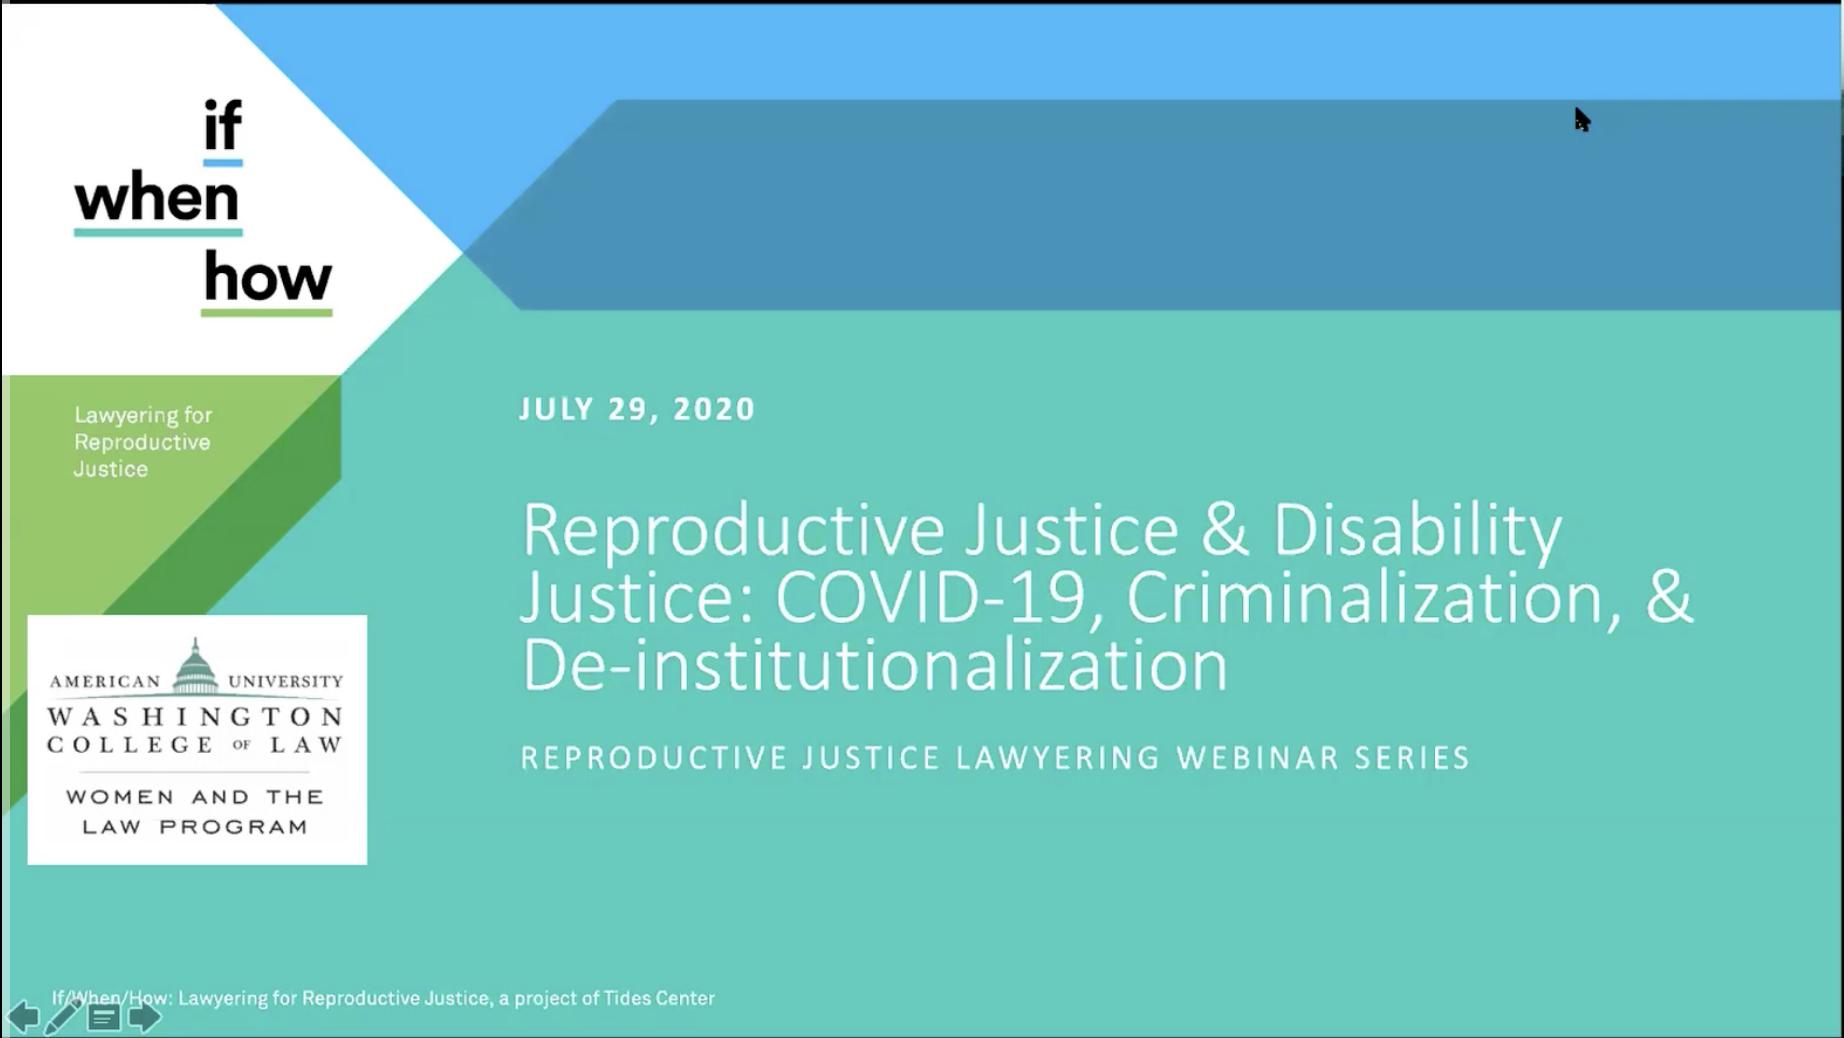 Reproductive Justice & Disability Justice: COVID-19, Criminalization, & De-institutionalization Webinar